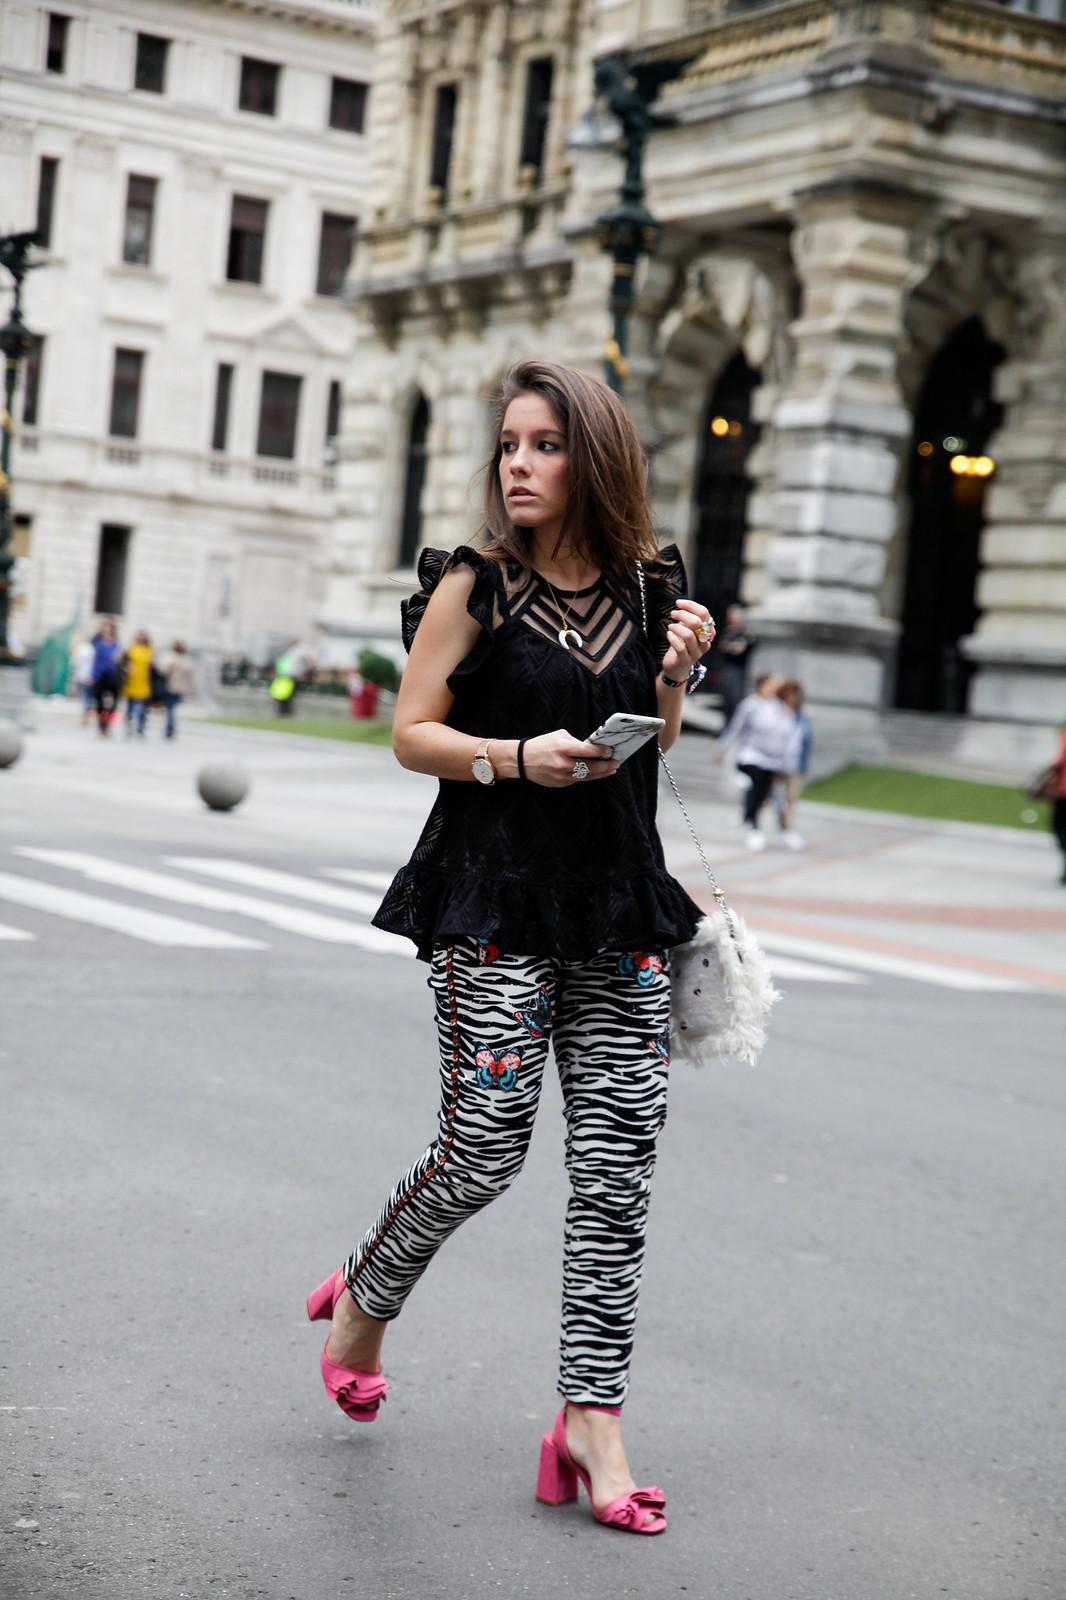 07_Pantalones_Zebra_Blusa_Boho_tacones_rosas_stradivarius_Theguestgirl_outfit_barcelona_streetstyle